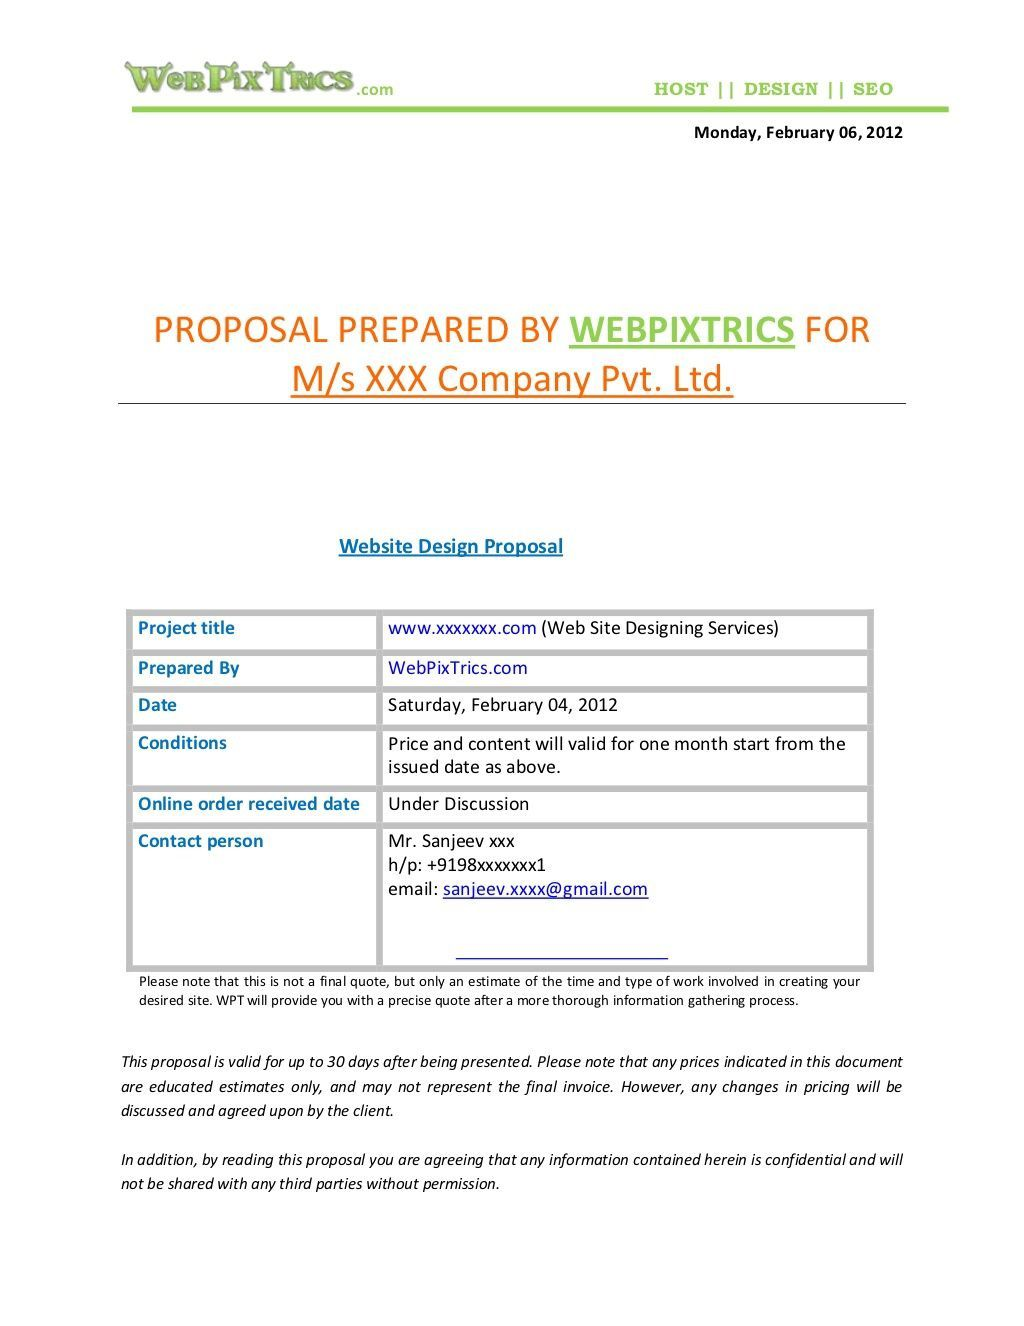 007 Stunning Web Design Proposal Template Free High Definition  Freelance DownloadFull